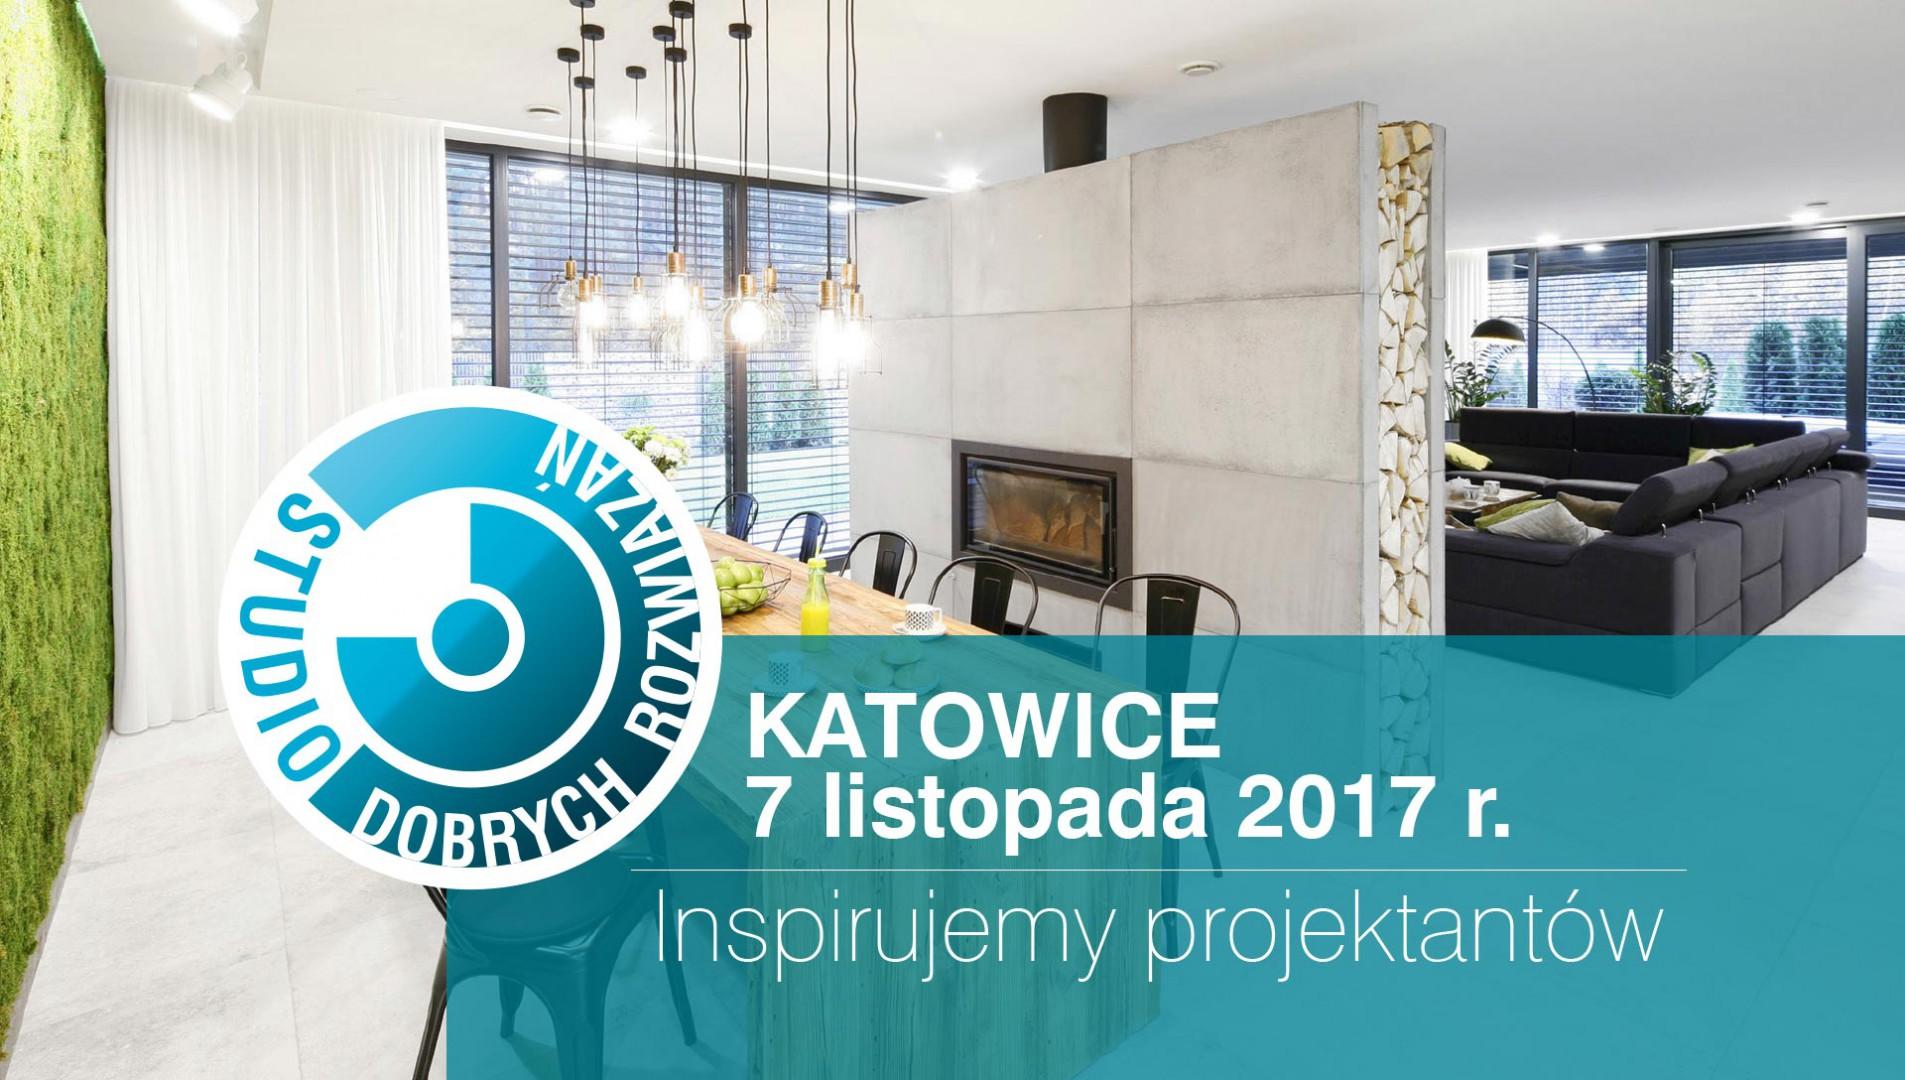 SDR Katowice 2017